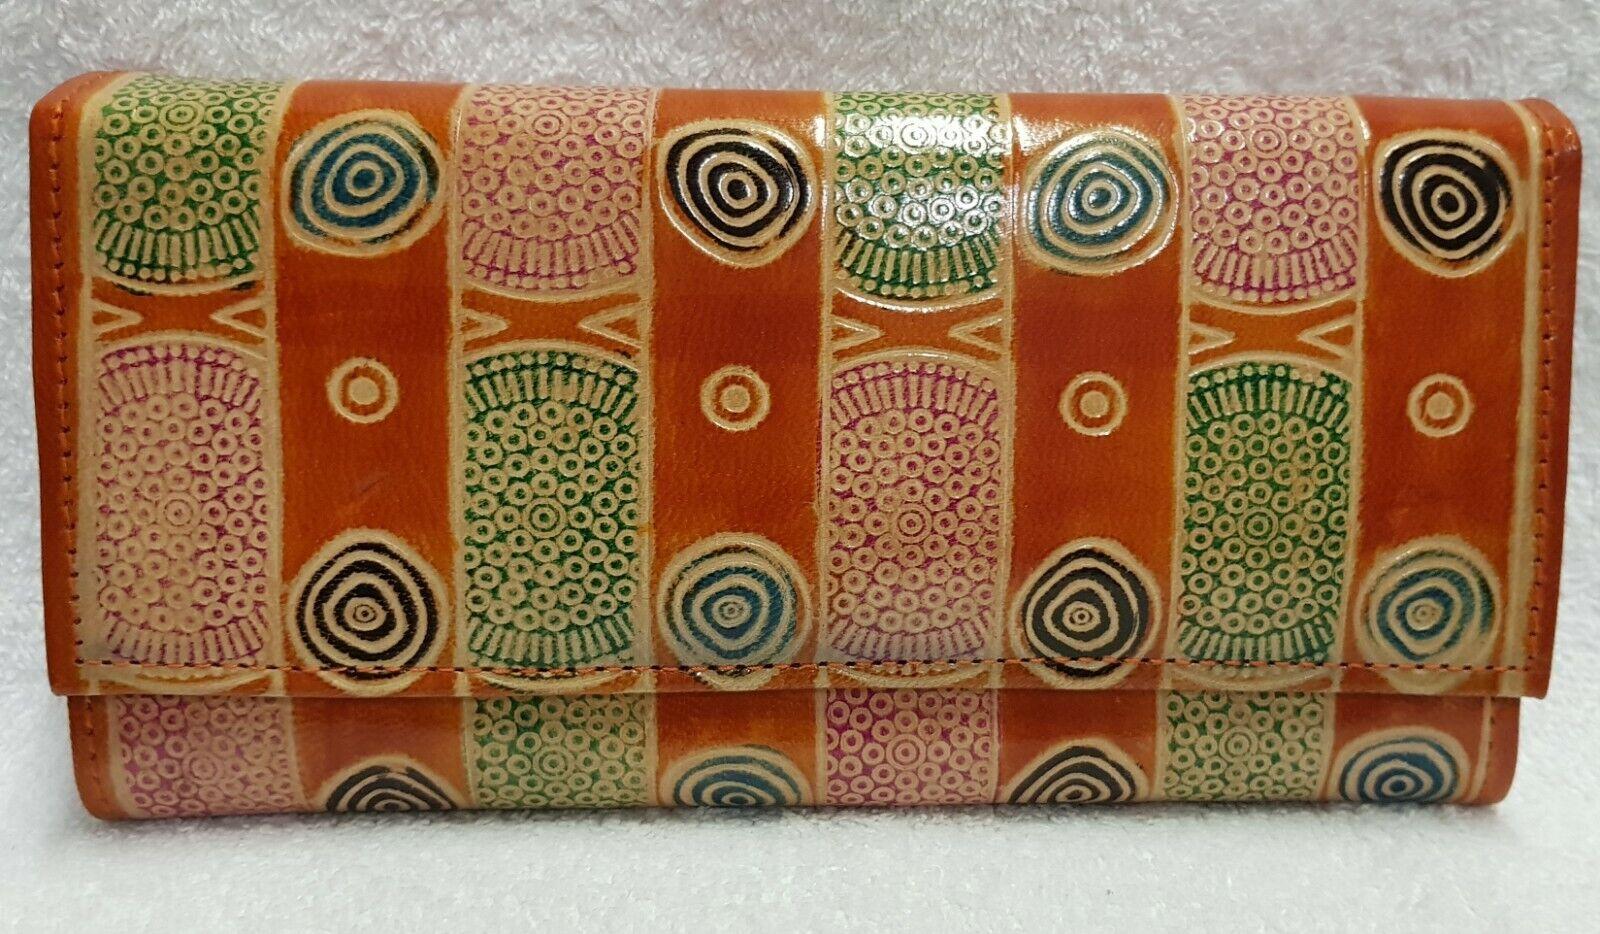 Leather genuine Hand Tooled Painted Shantiniketan Ethnic Boho Clutch/Wallet